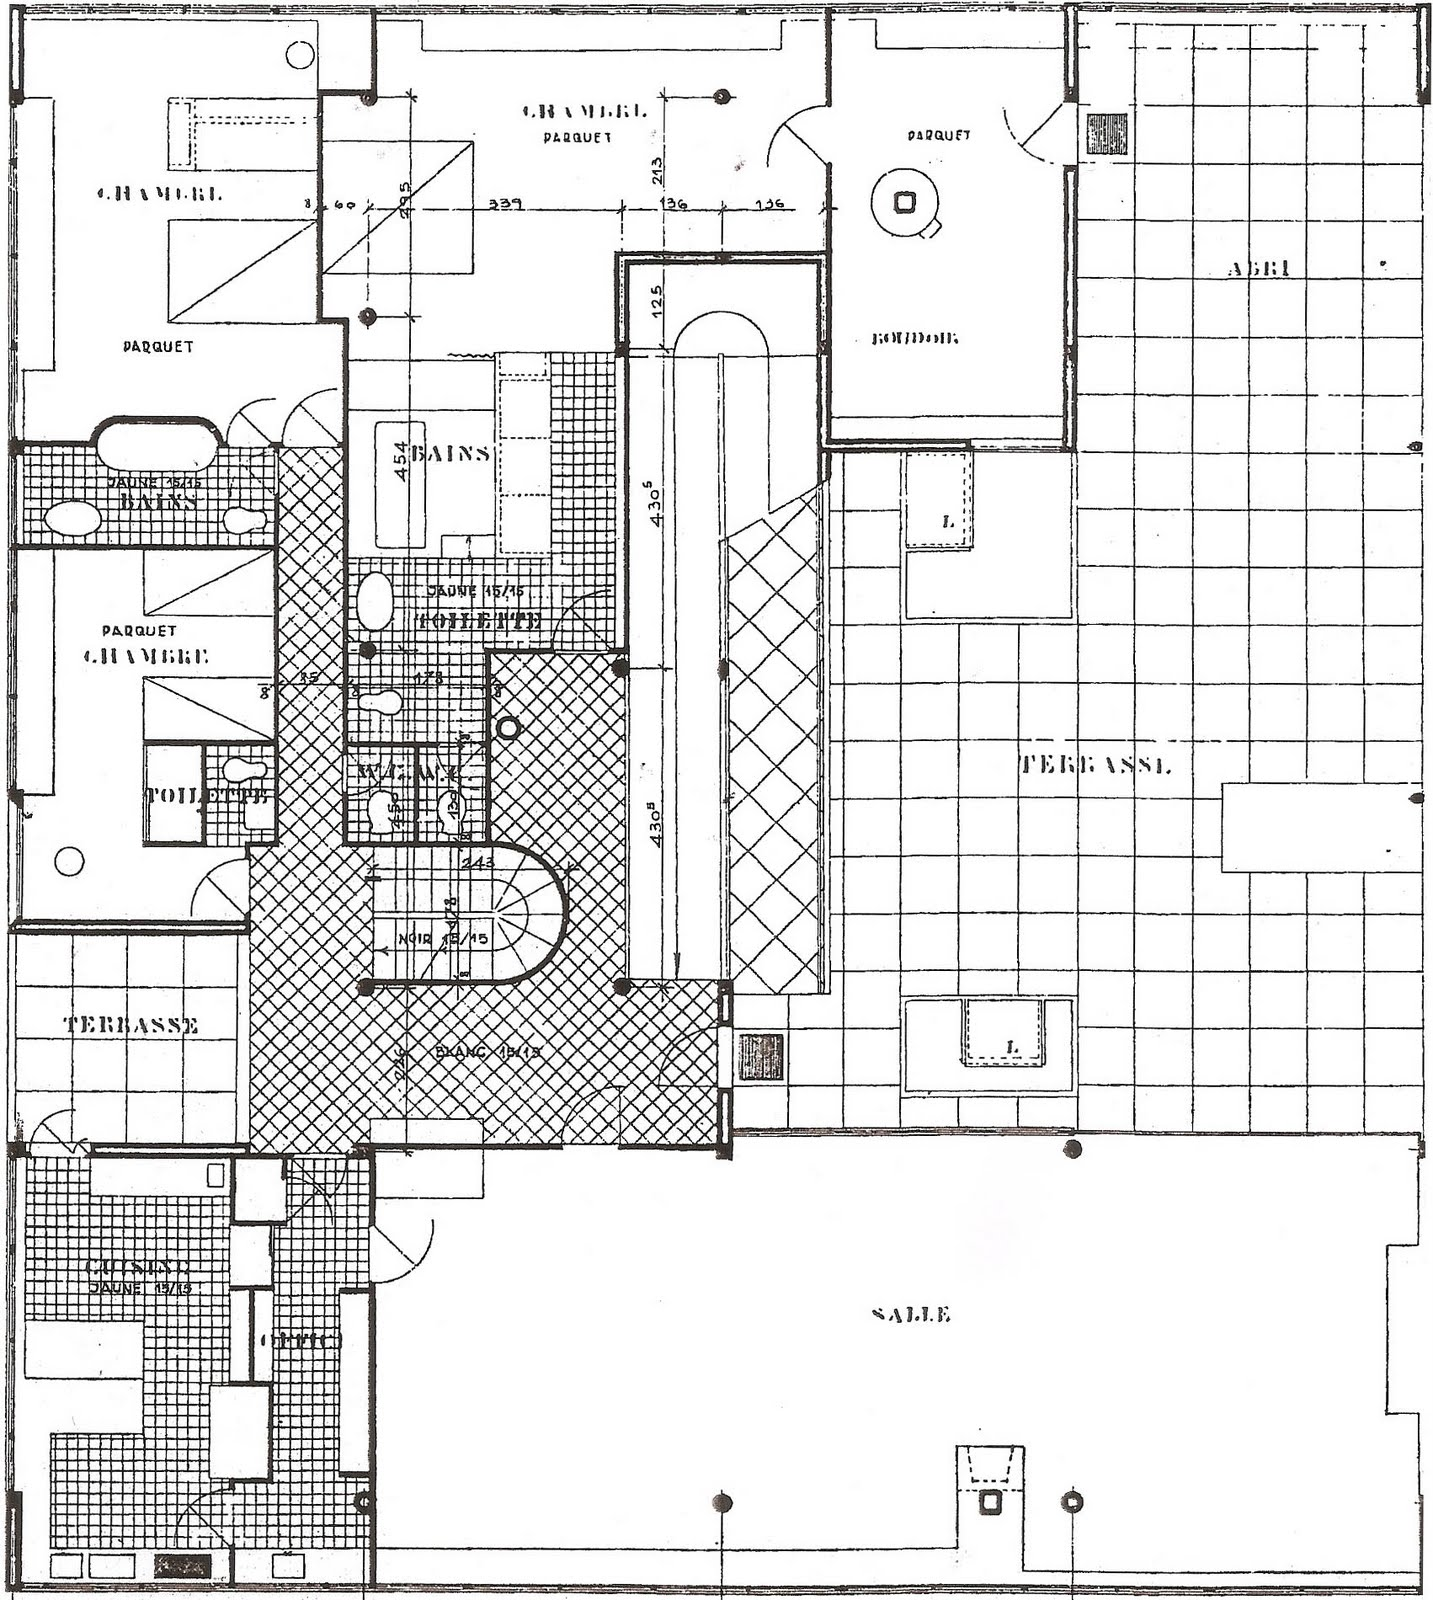 Linh Nguyen ARCH1201Villa Savoye 2nd Floor Plan